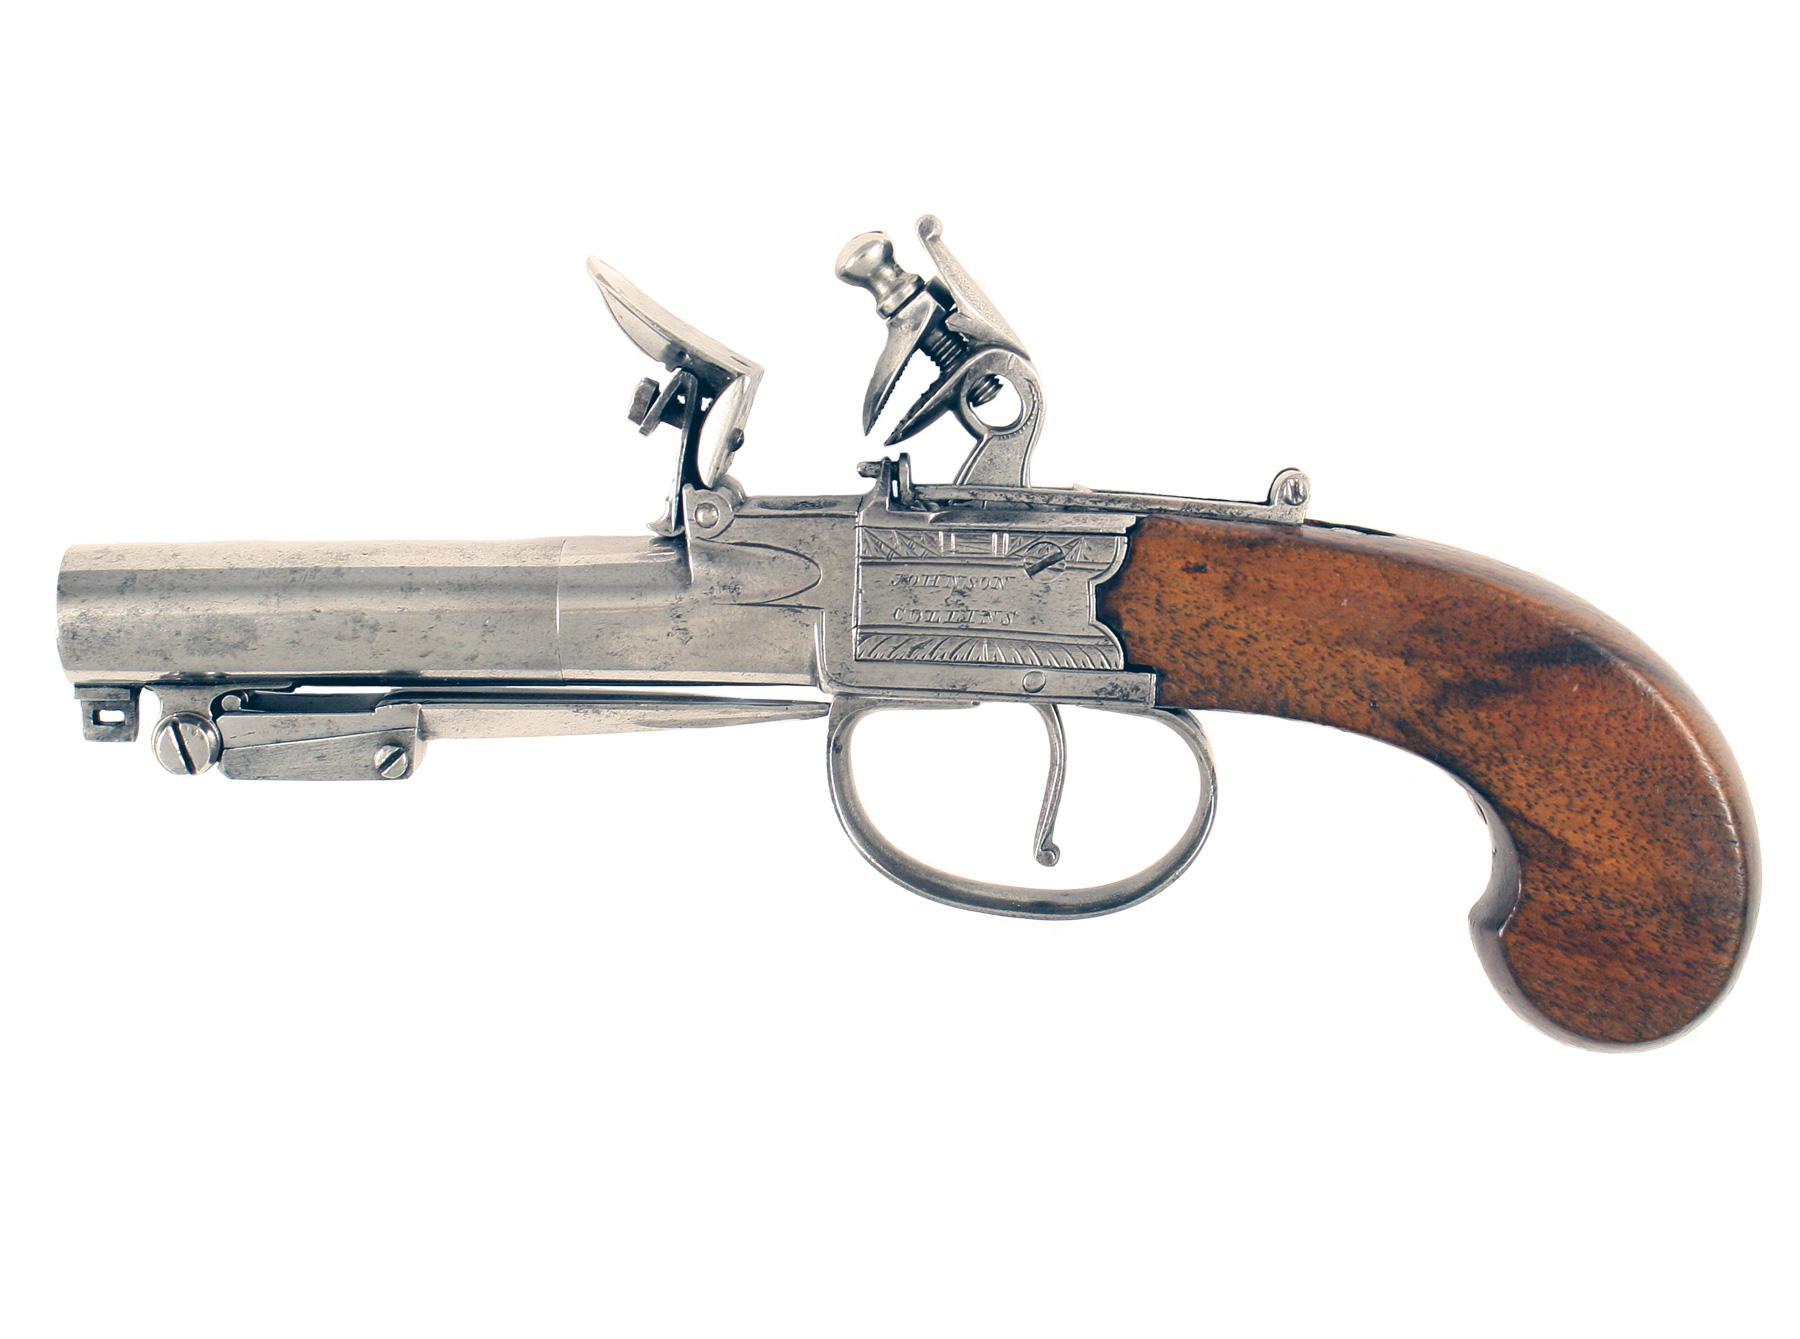 A Flintlock Pocket Pistol by Johnson & Collins